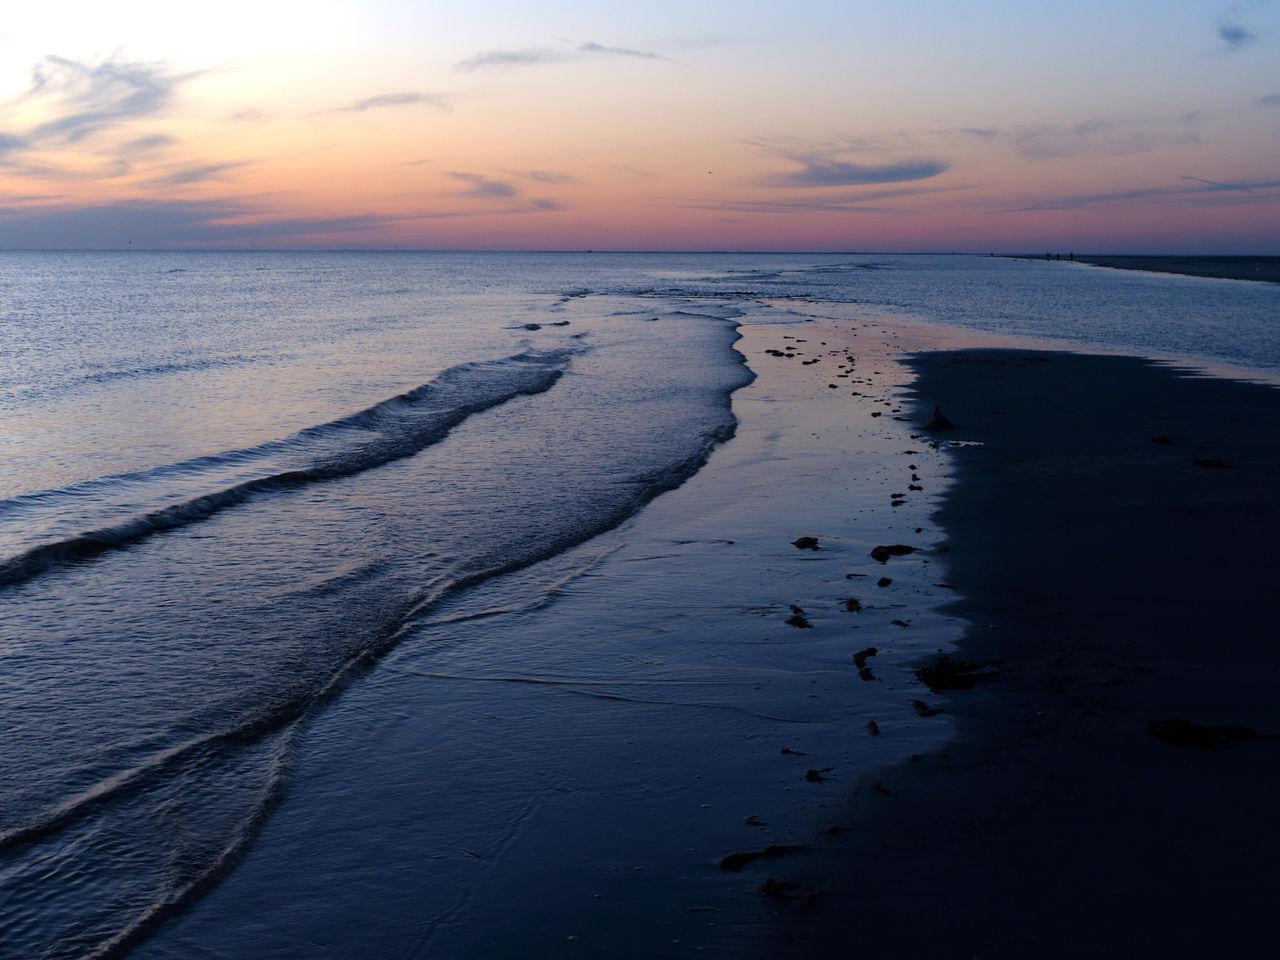 sky, sea, sunset, water, scenics - nature, horizon over water, horizon, beauty in nature, beach, tranquility, land, tranquil scene, cloud - sky, nature, no people, idyllic, outdoors, orange color, non-urban scene